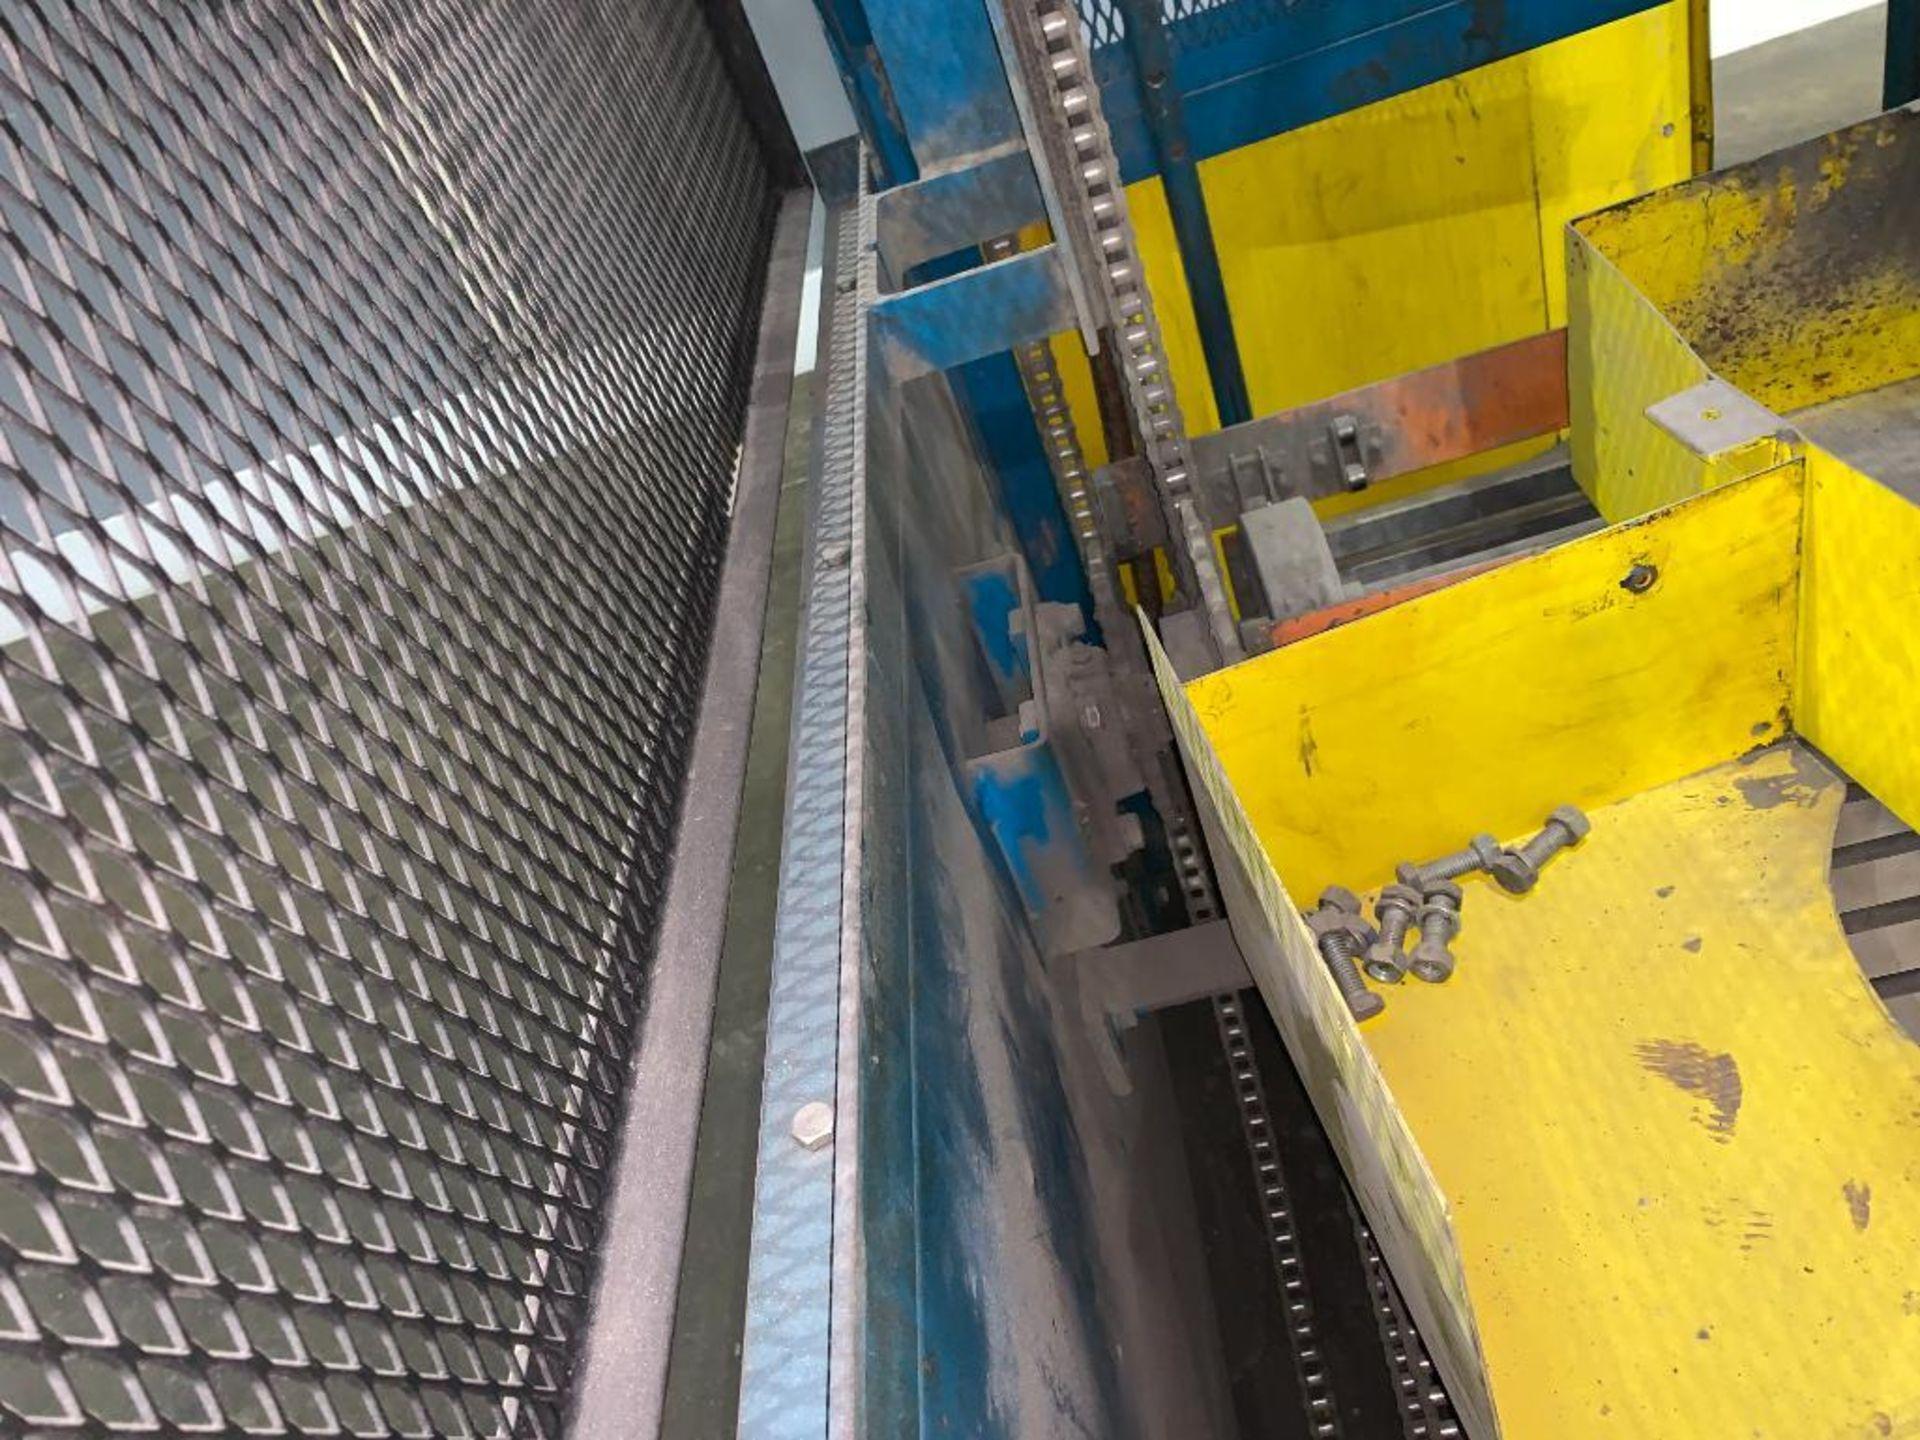 TKF vertical case elevator parts - Image 9 of 13